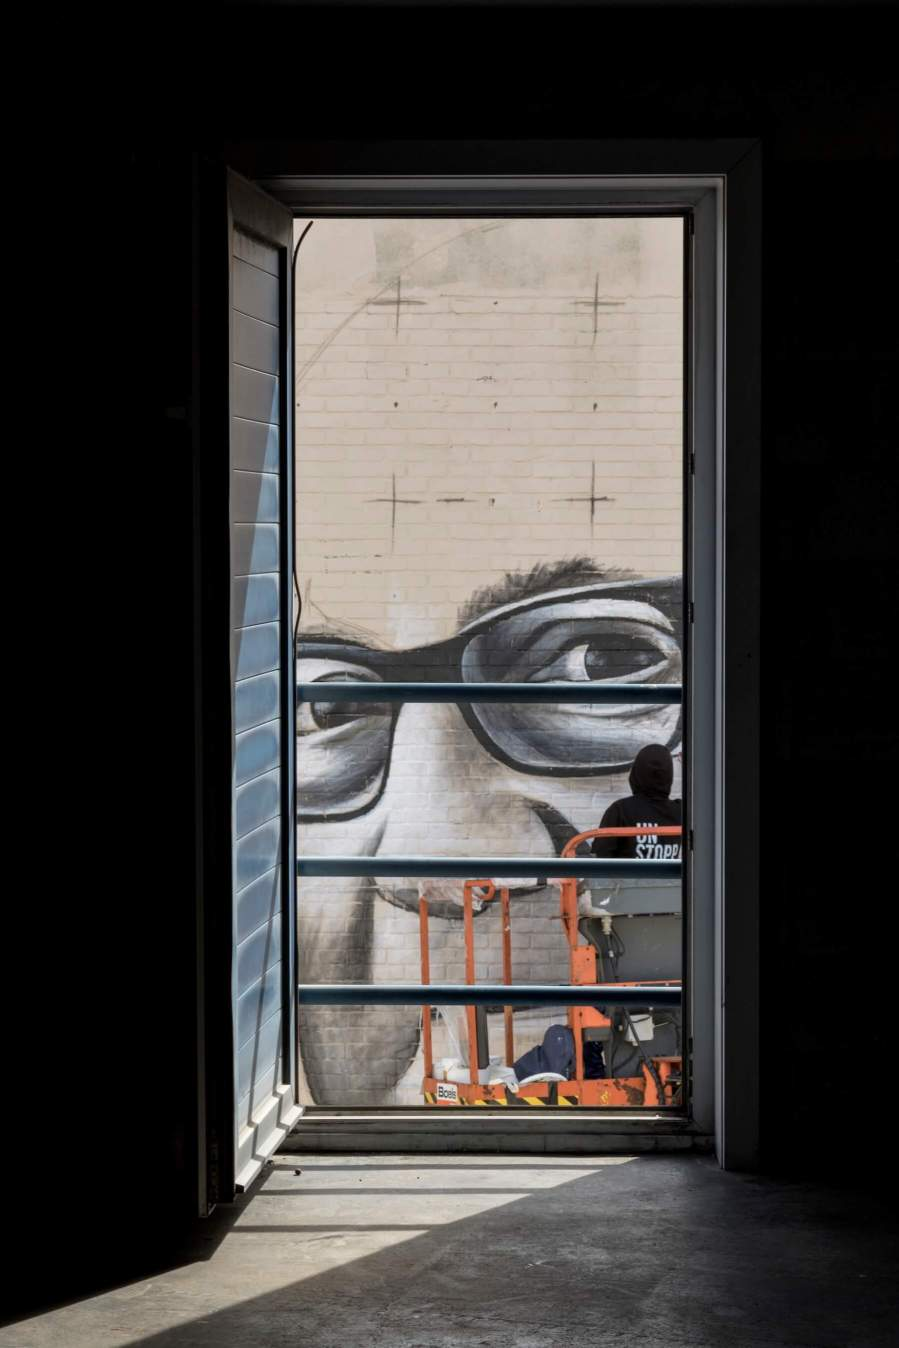 Ben Slow, The Crystal Ship, Urban Art Festival 2018. Photo Credit Henrik Haven